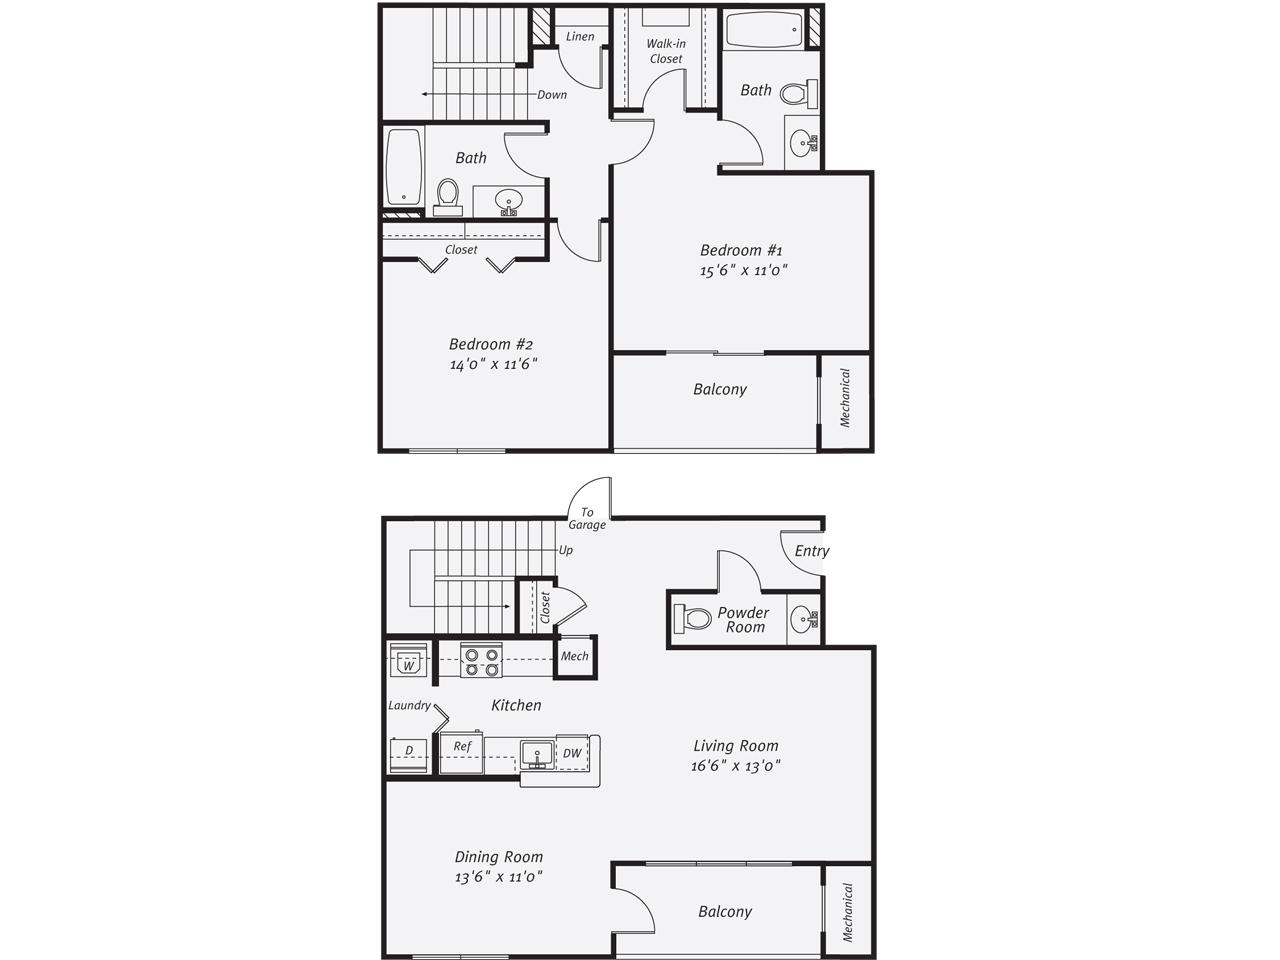 Ny coram thepointatpineridge p0571769 ny014 bt7g 2 floorplan